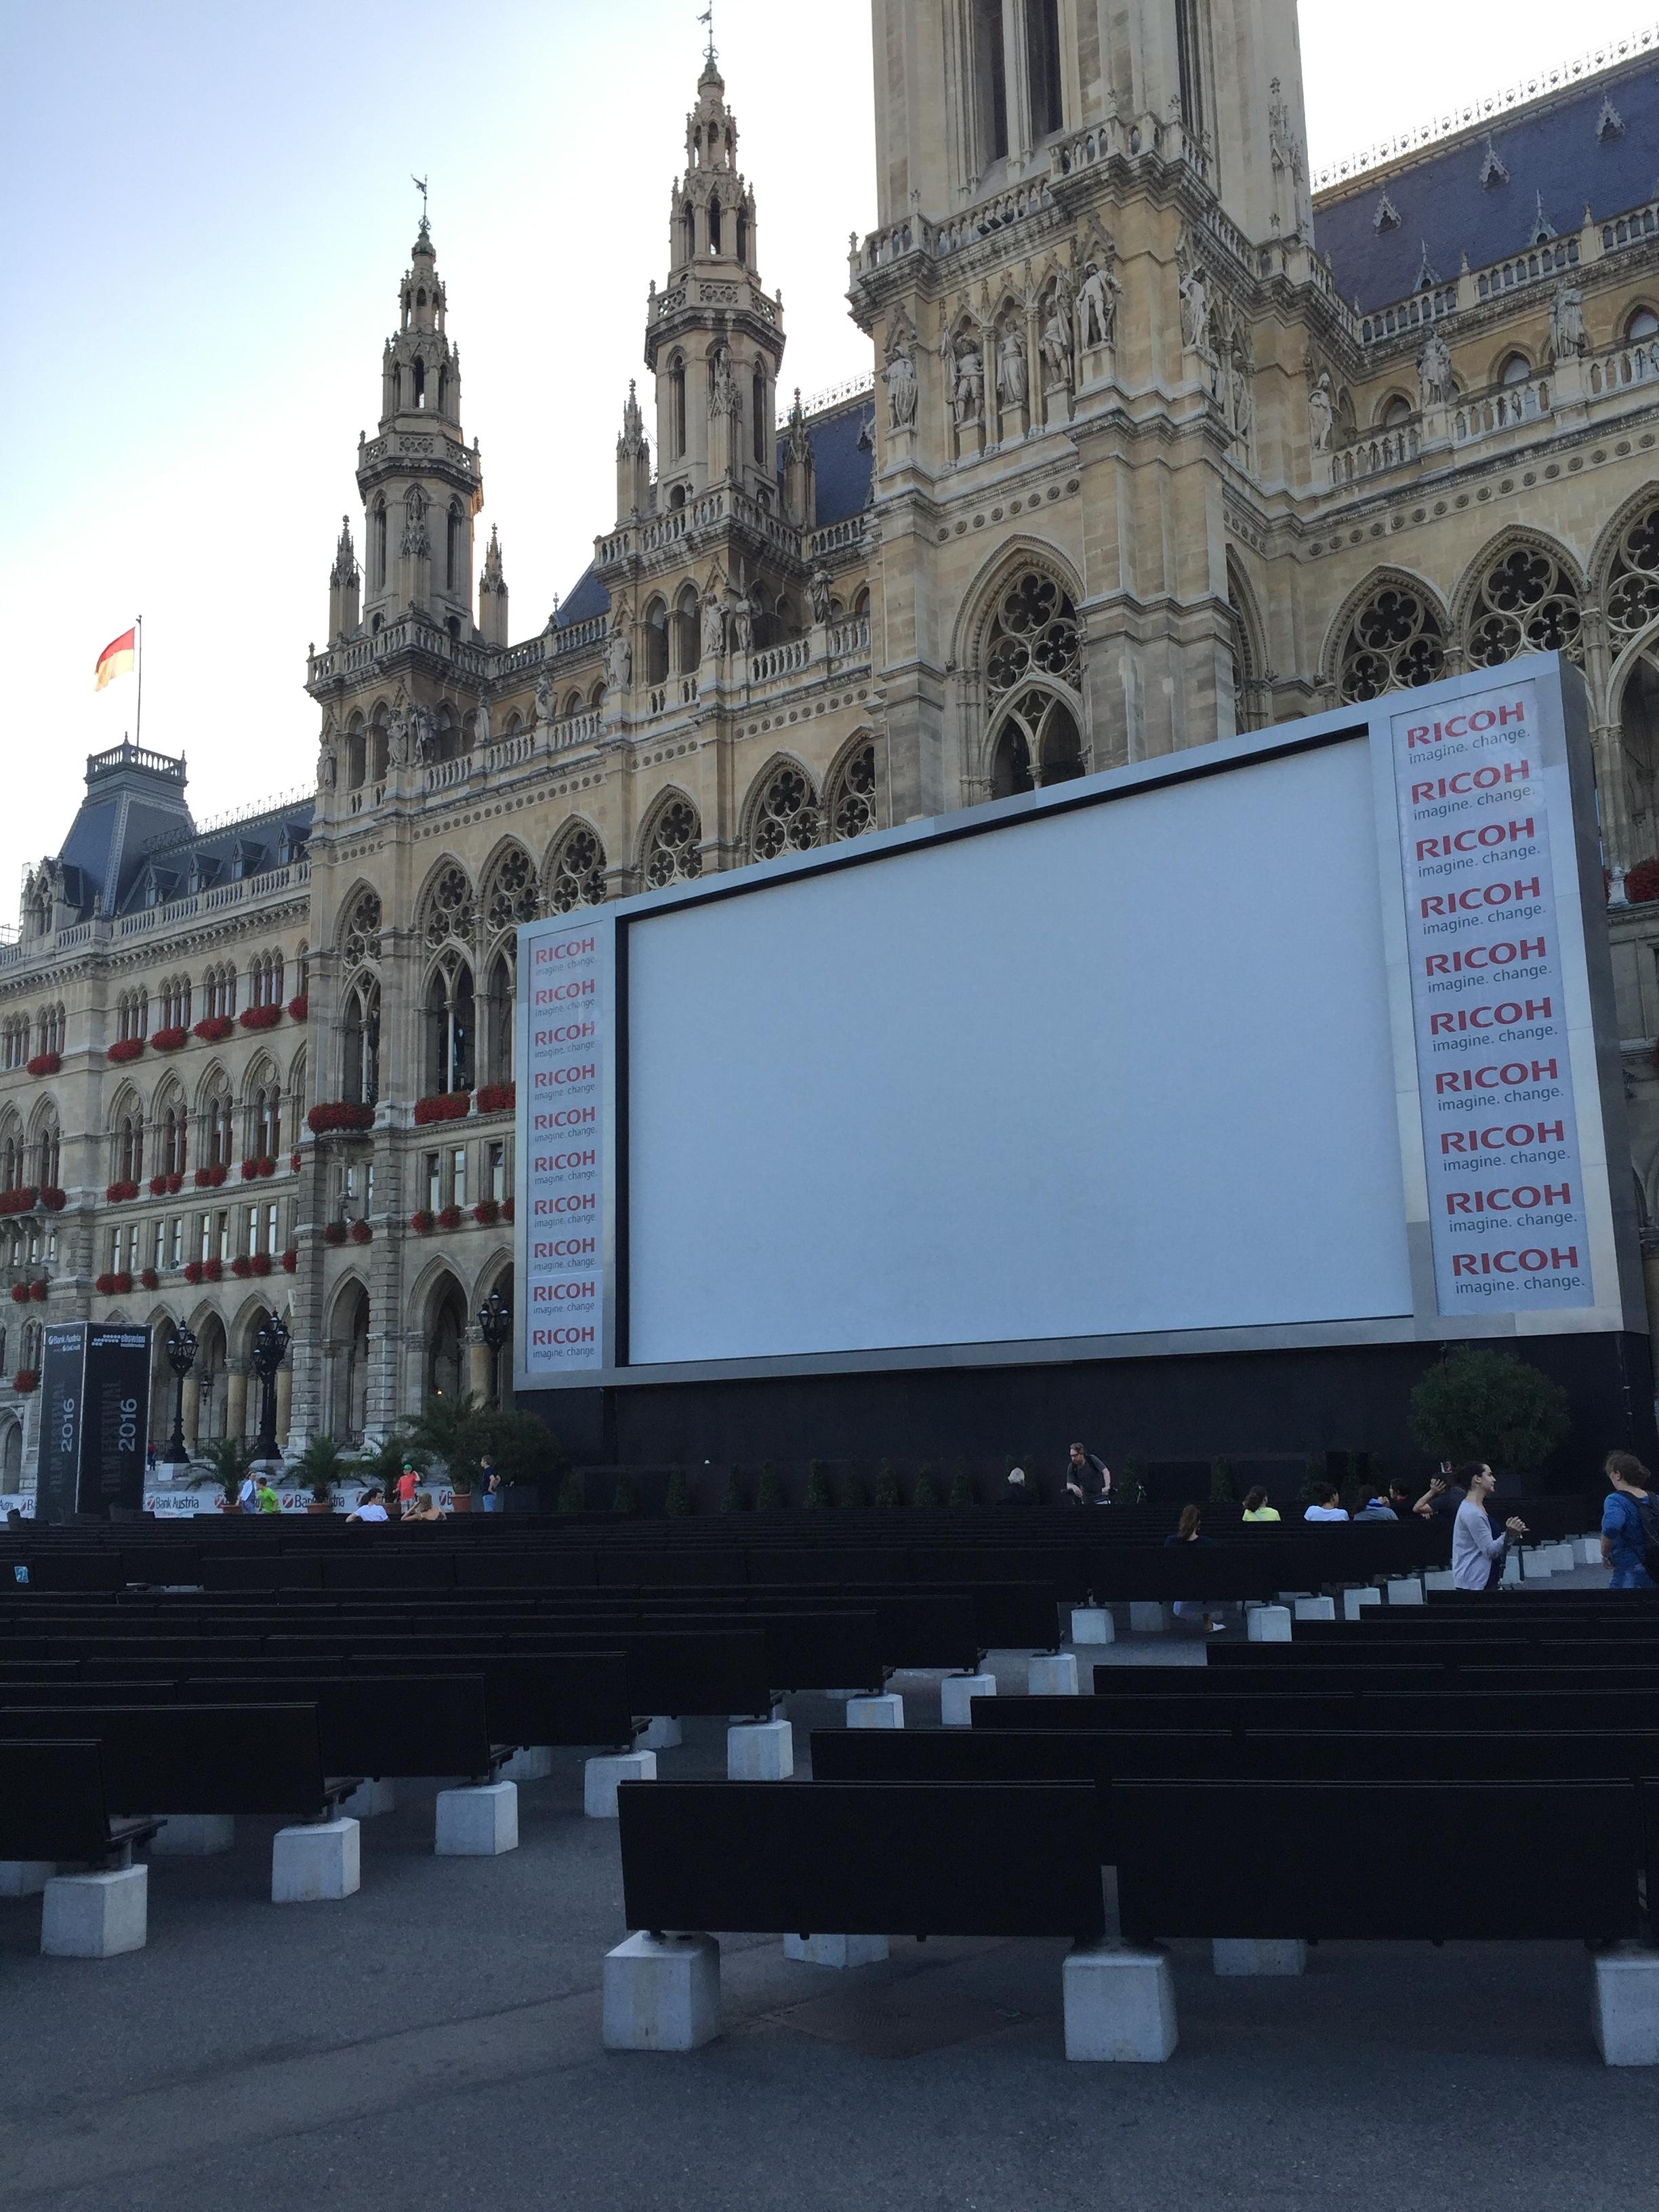 The outdoor film festival at the  Rathausplatz.